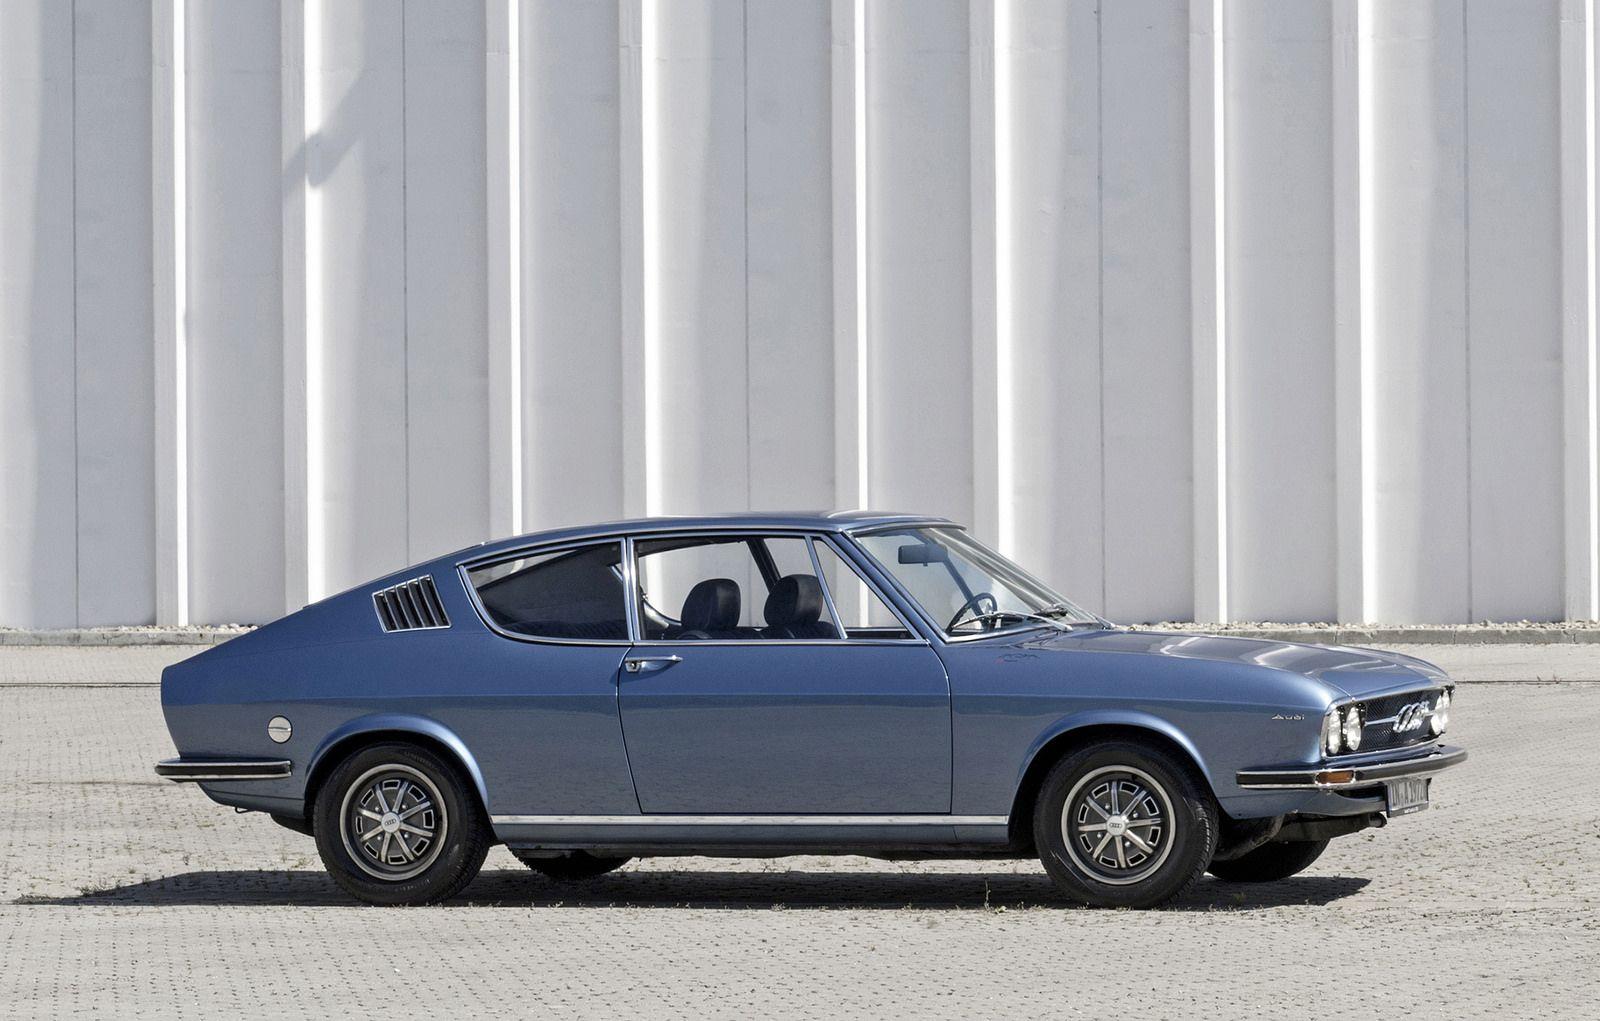 1970 Audi 100 Coupé S (C1)   Audi 100 coupé s, Audi 100, Audi